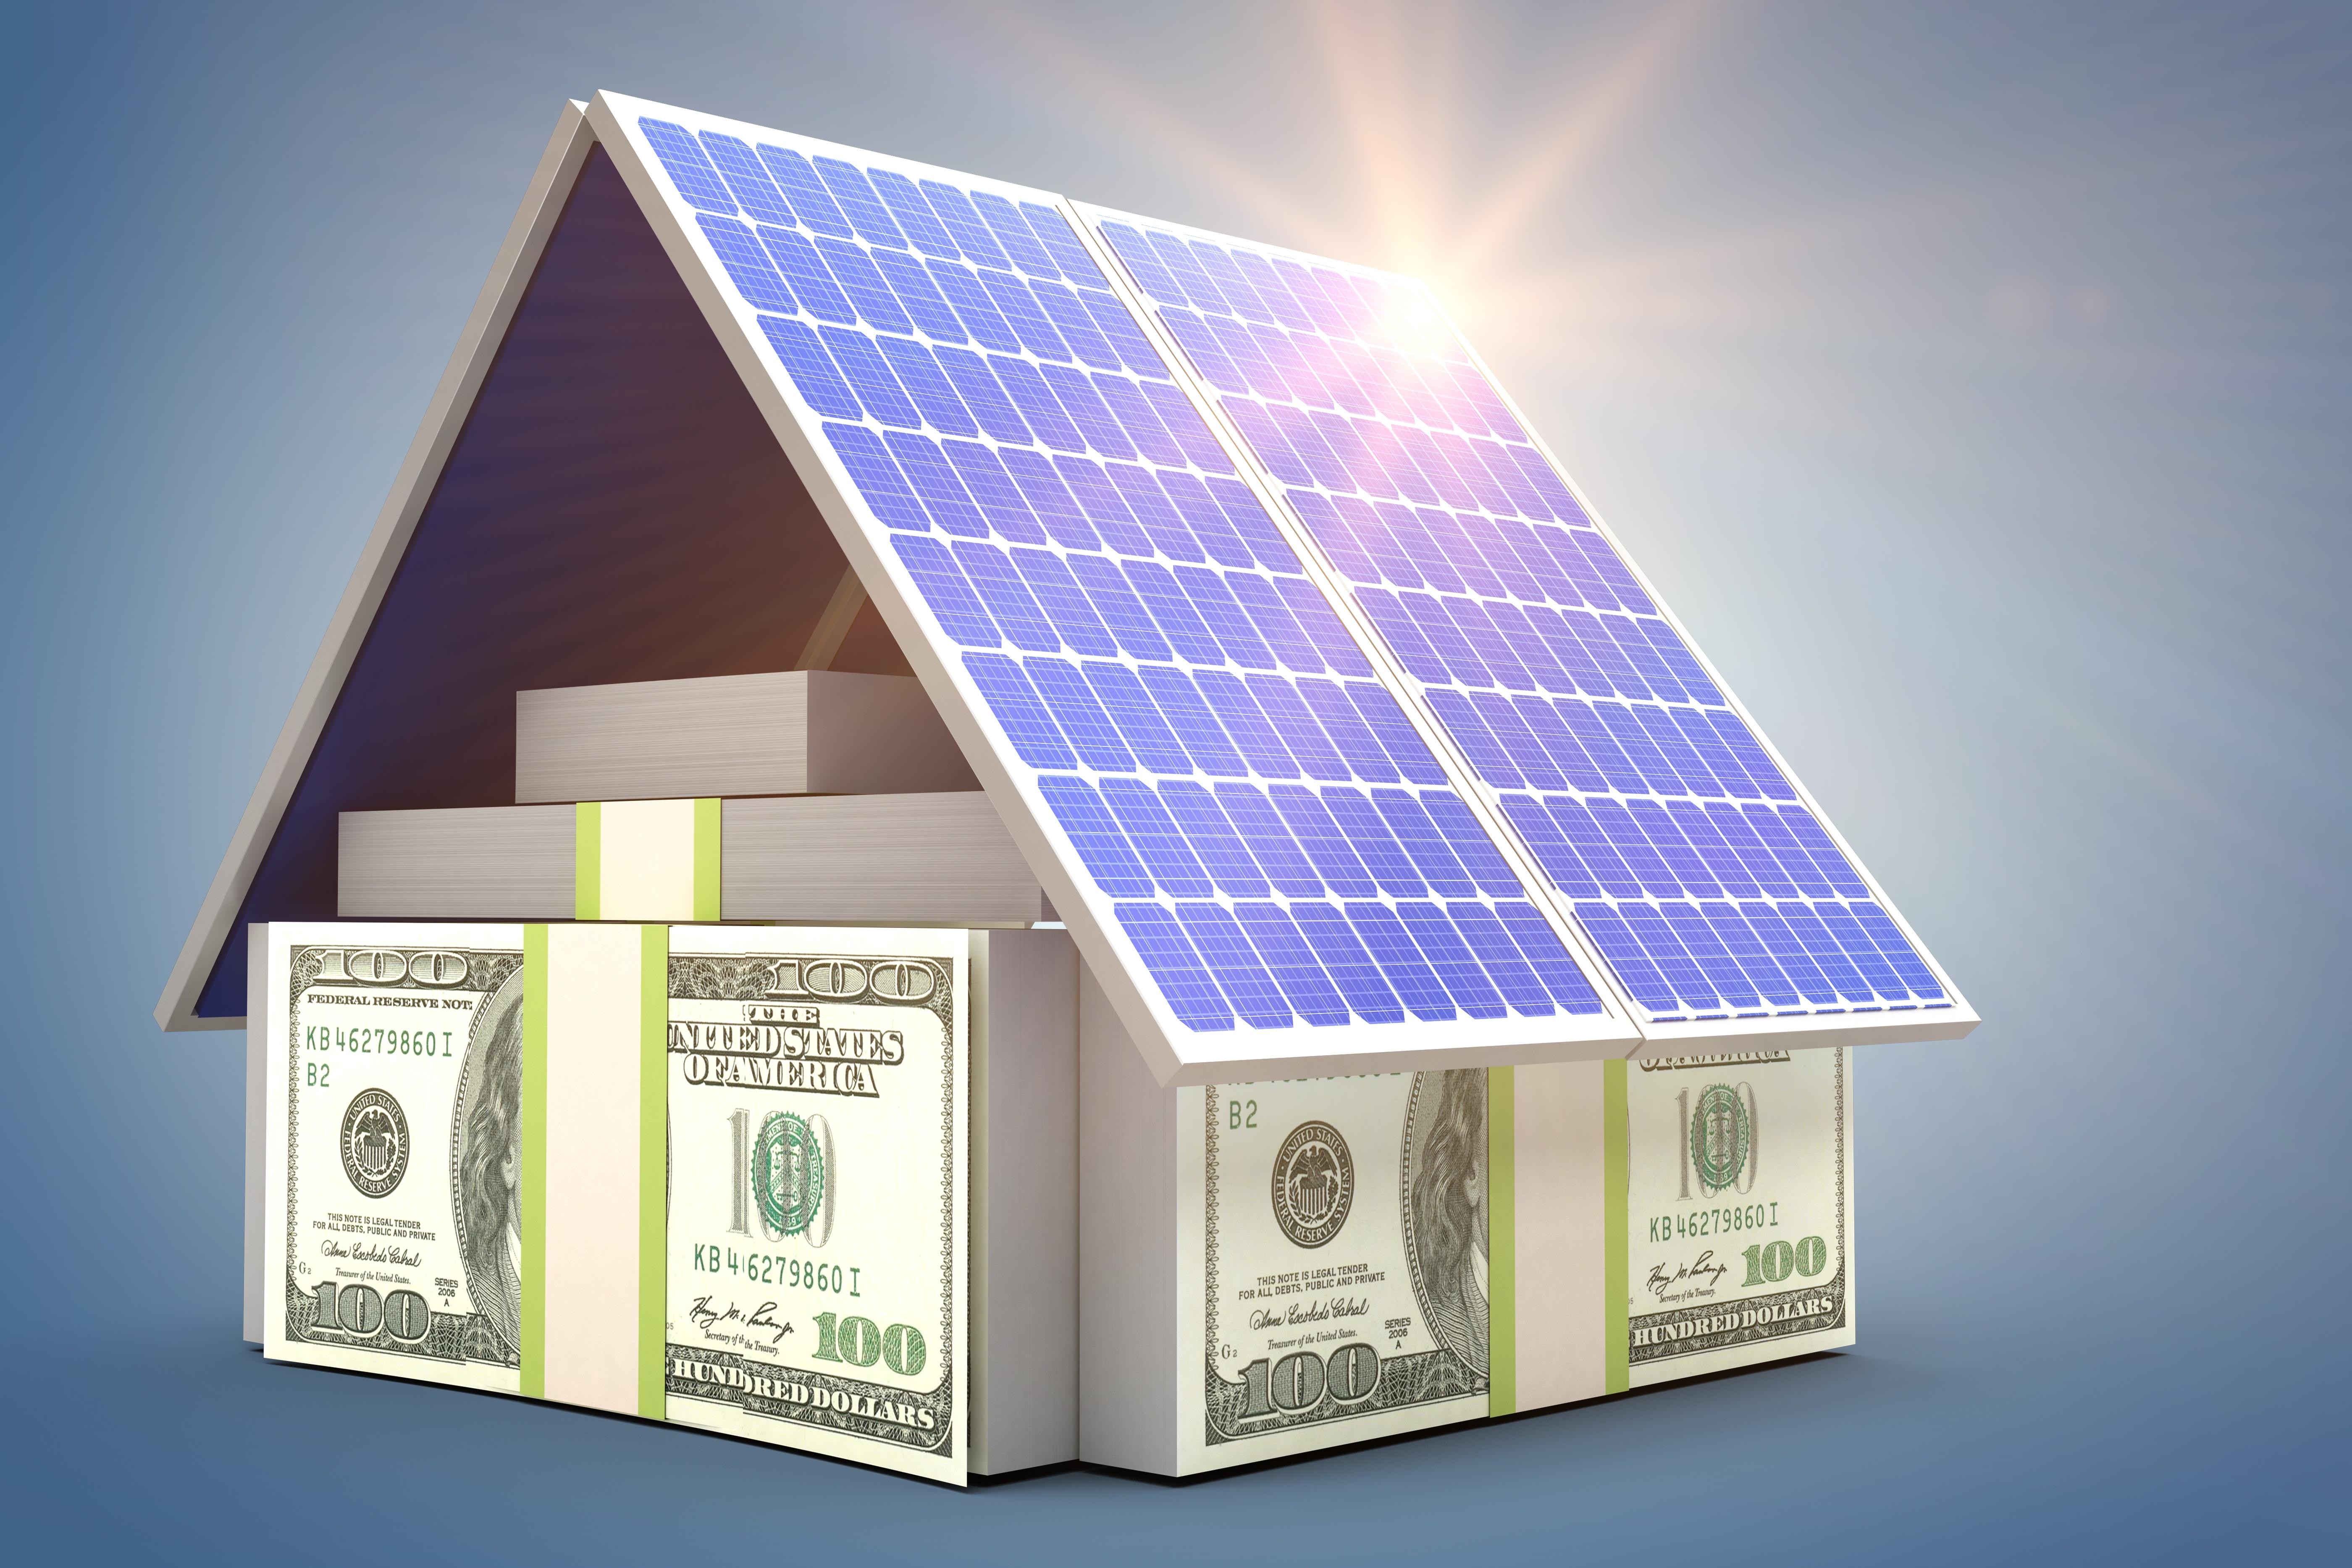 Saving With Solar Image